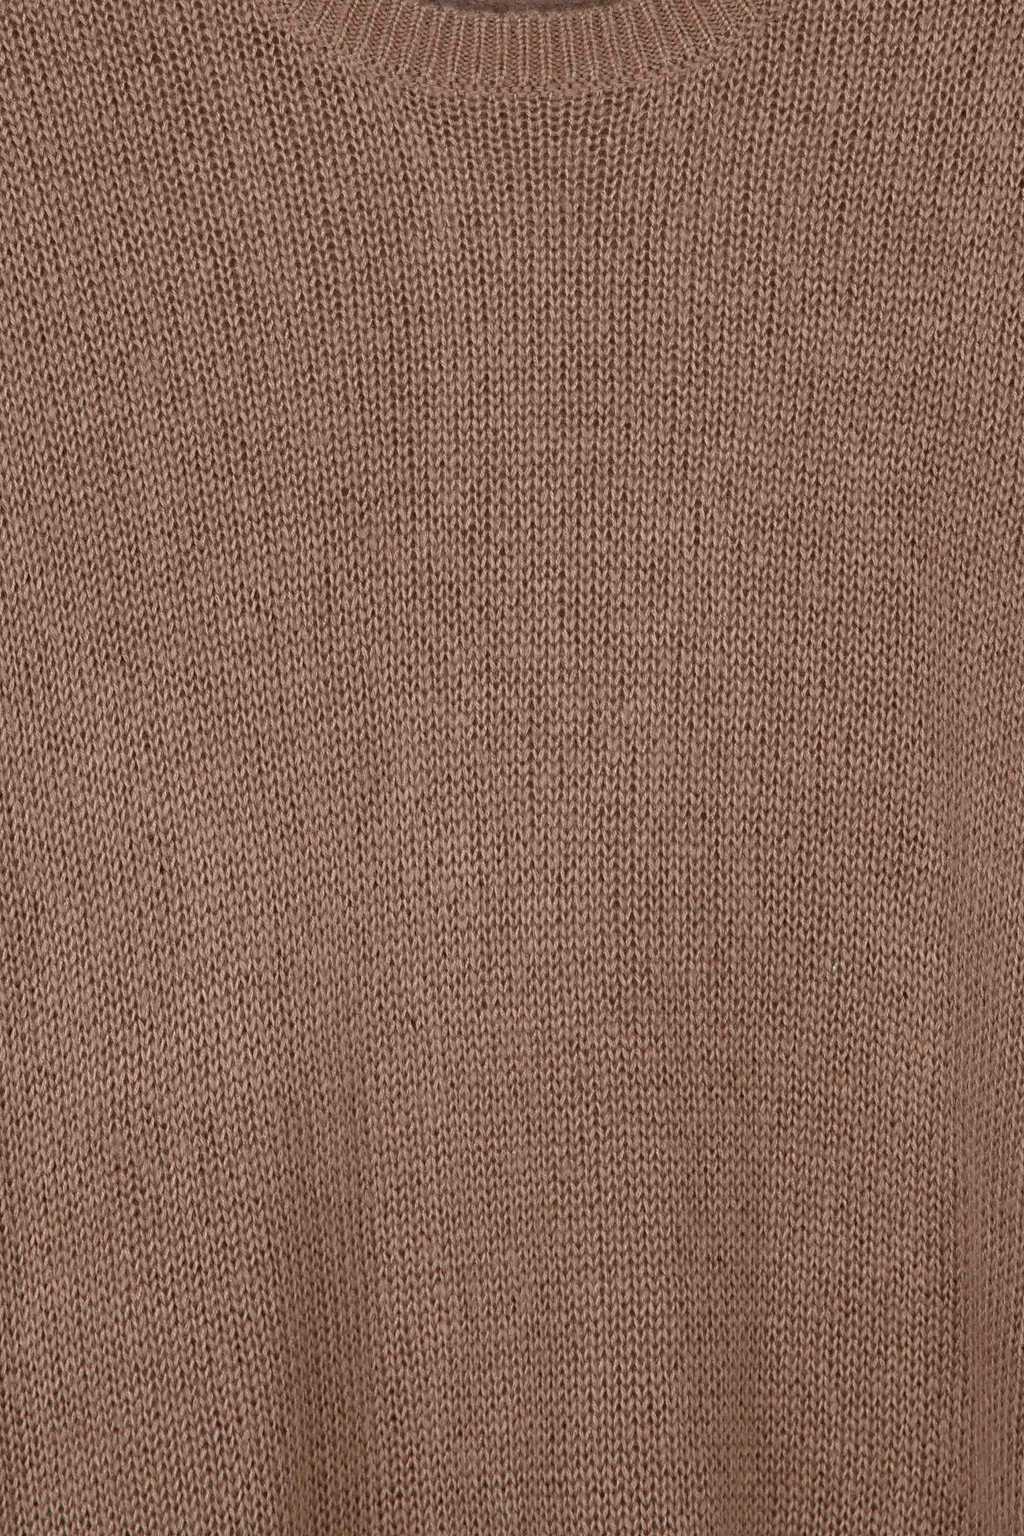 Sweater 3677 Terracotta 8